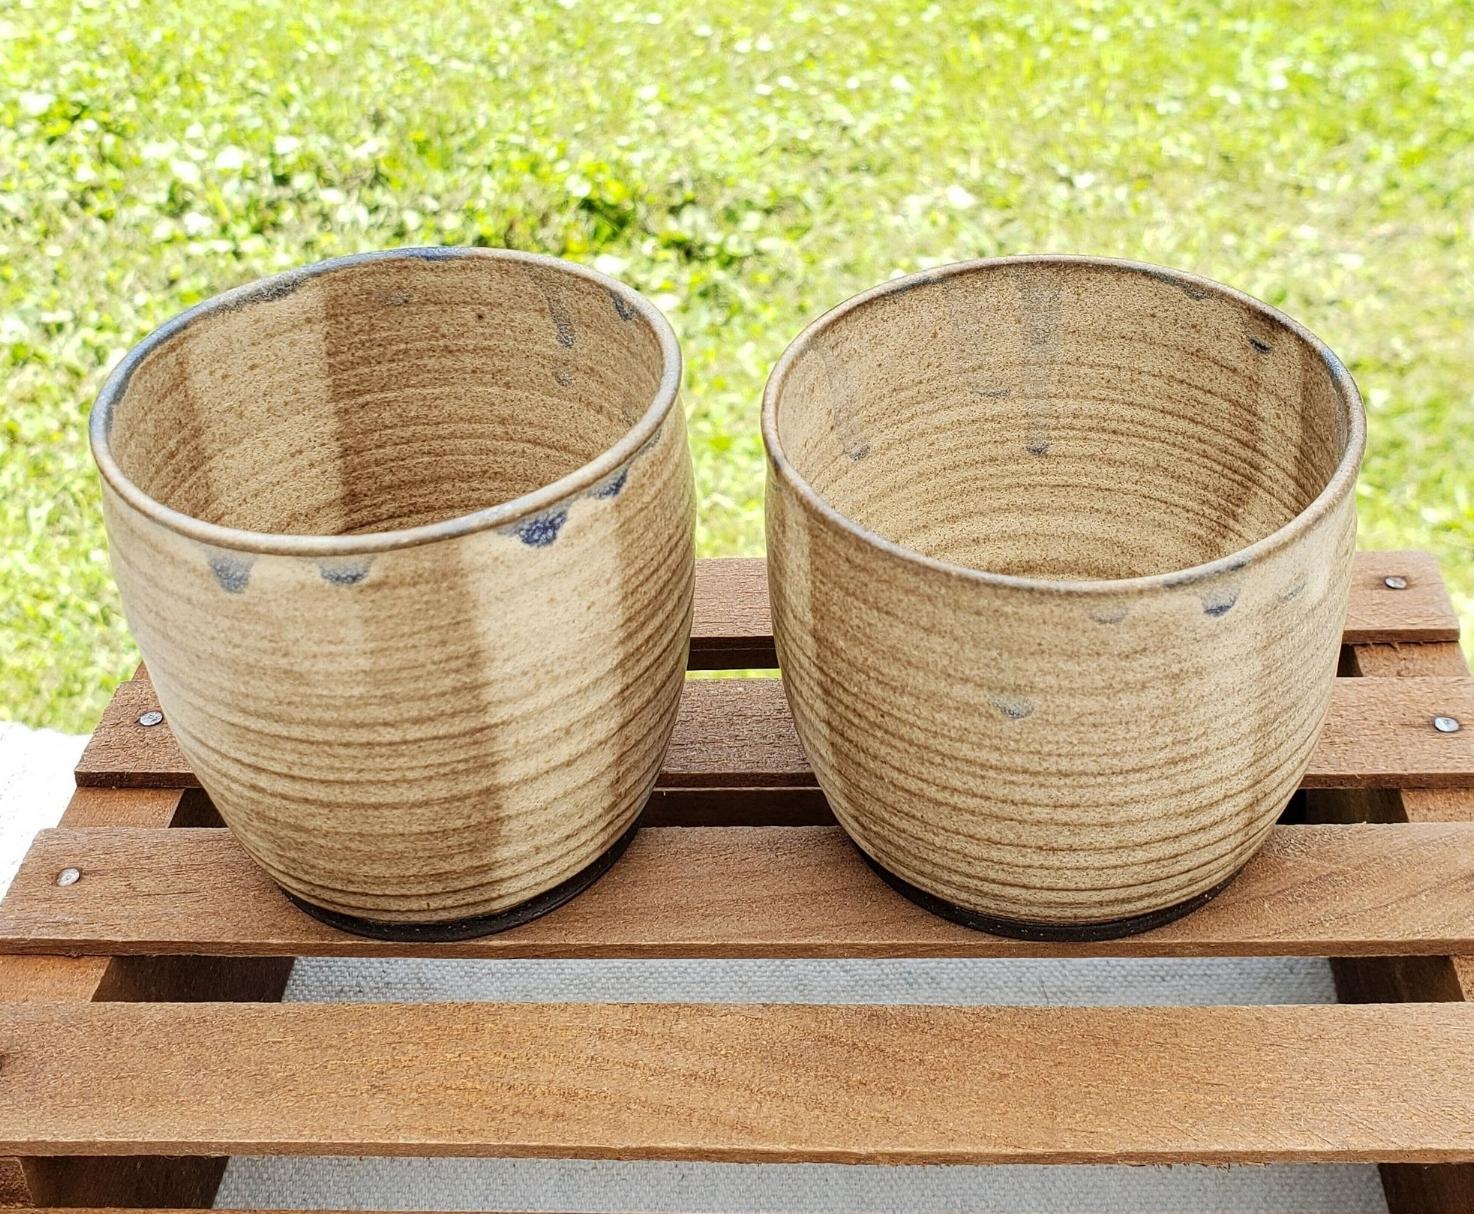 tumblers - cream and cobalt glazedark brown clay body6 ounce capacity$17 each$32 for set#ST001 (L) #ST002 (R)